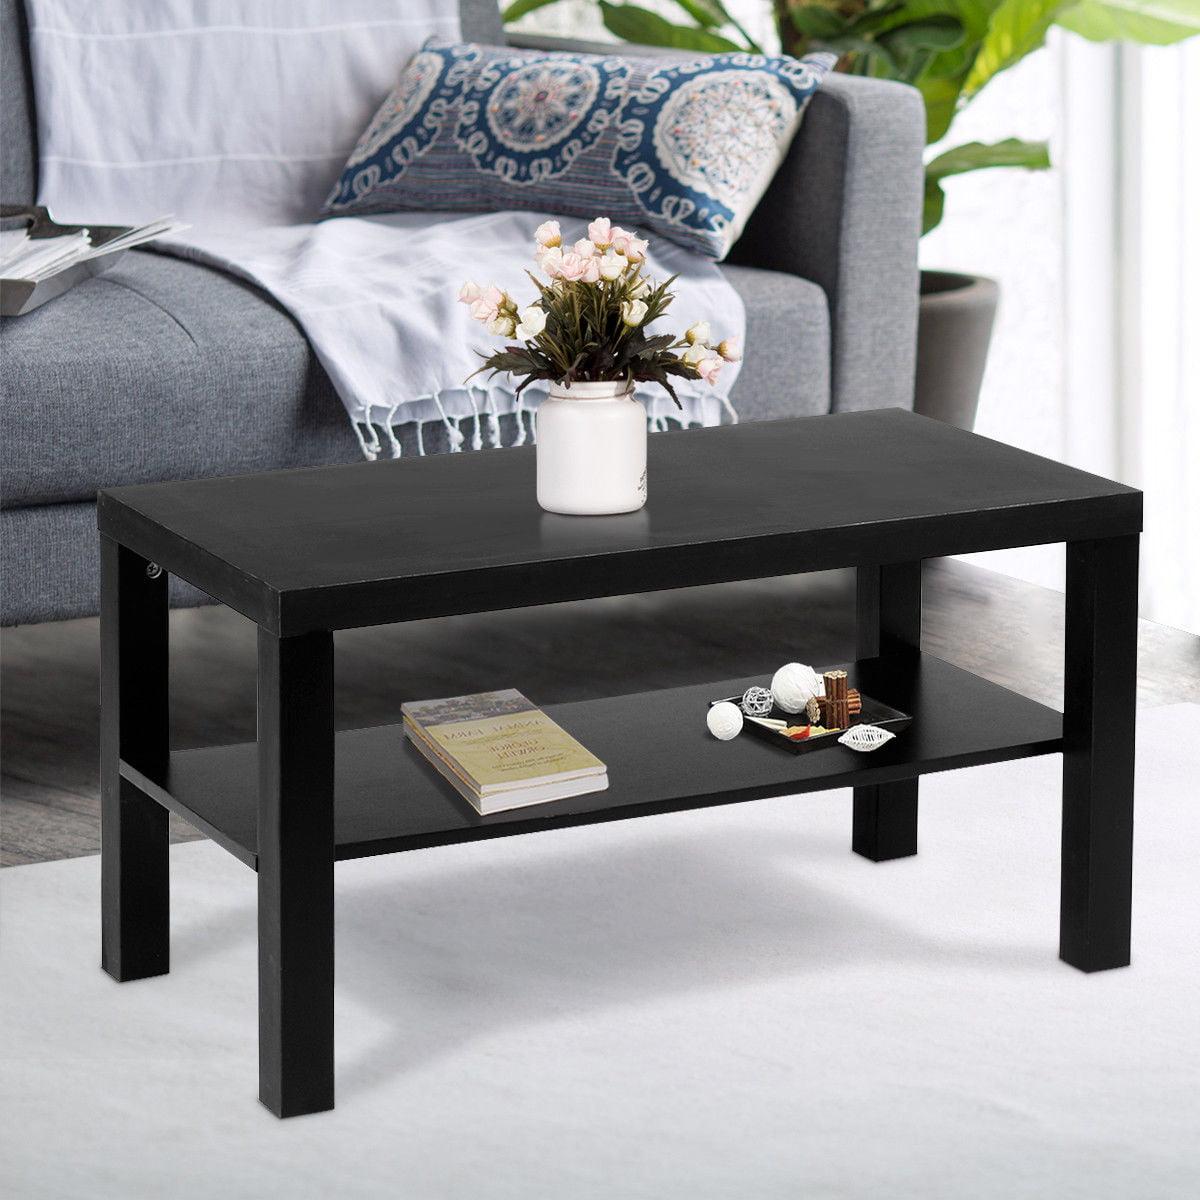 Costway coffee end table rectangle modern living room furniture w storage shelf black walmart com